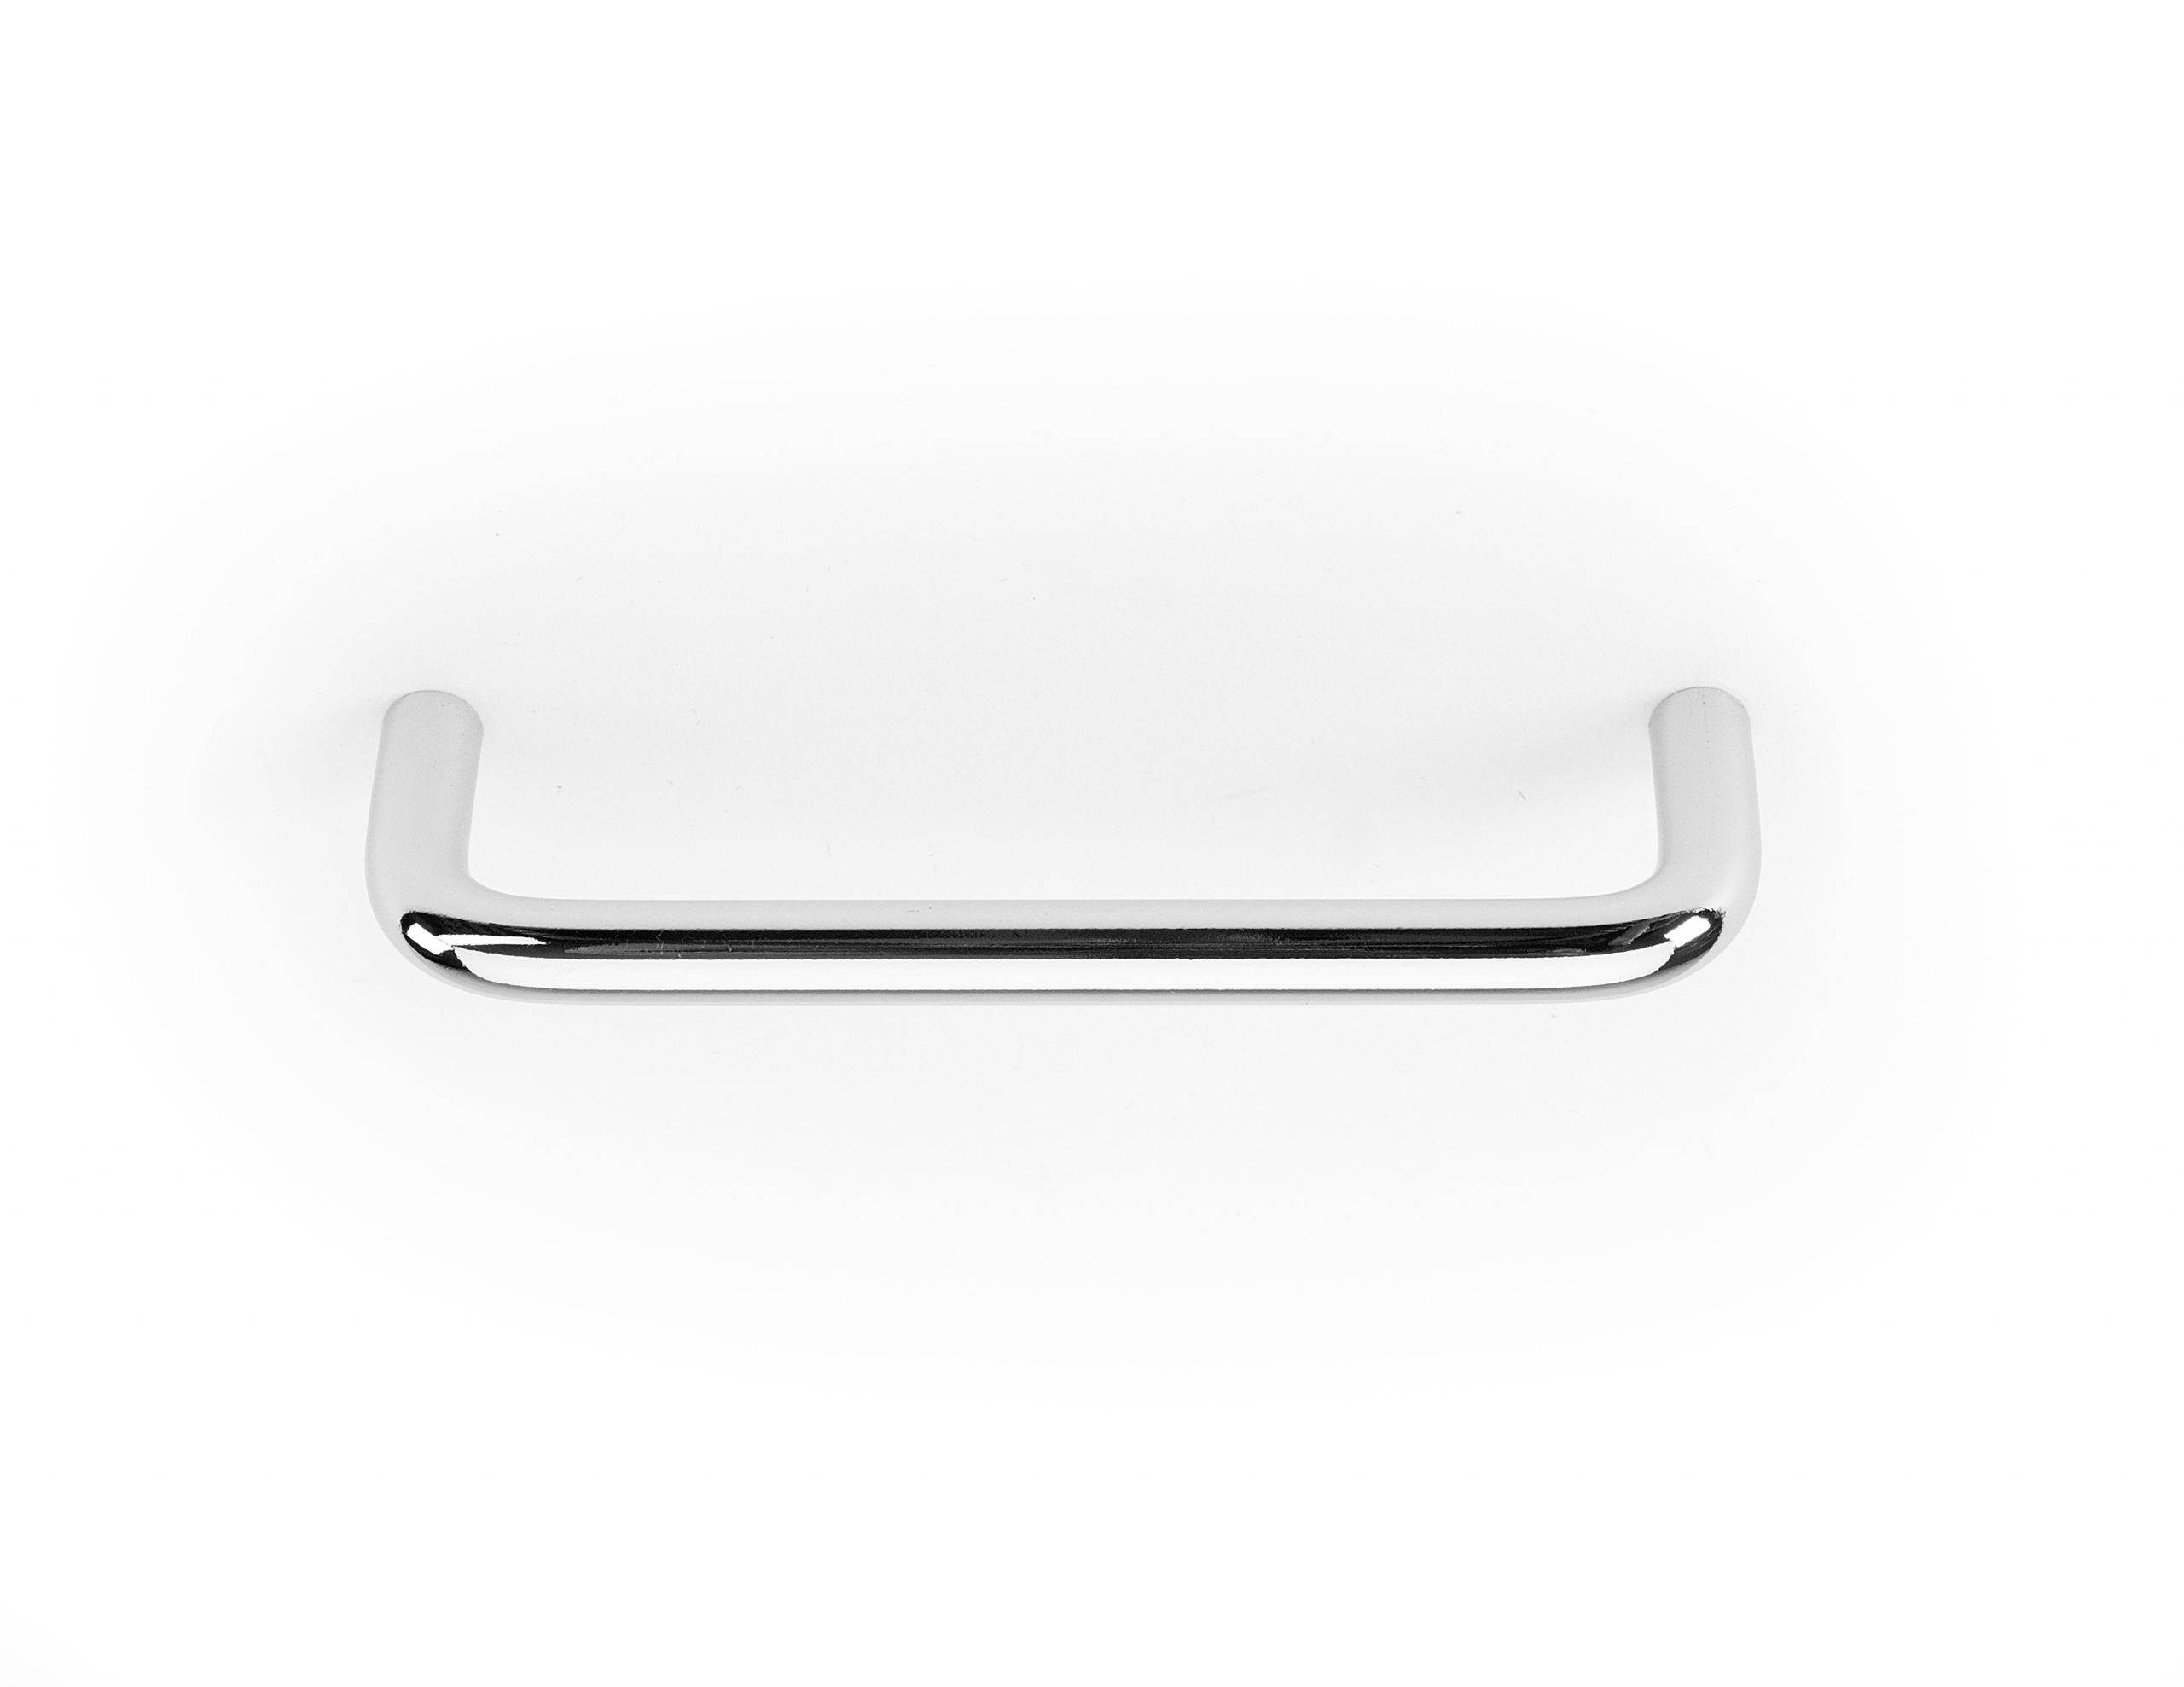 96mm Handle - Straight - Chrome